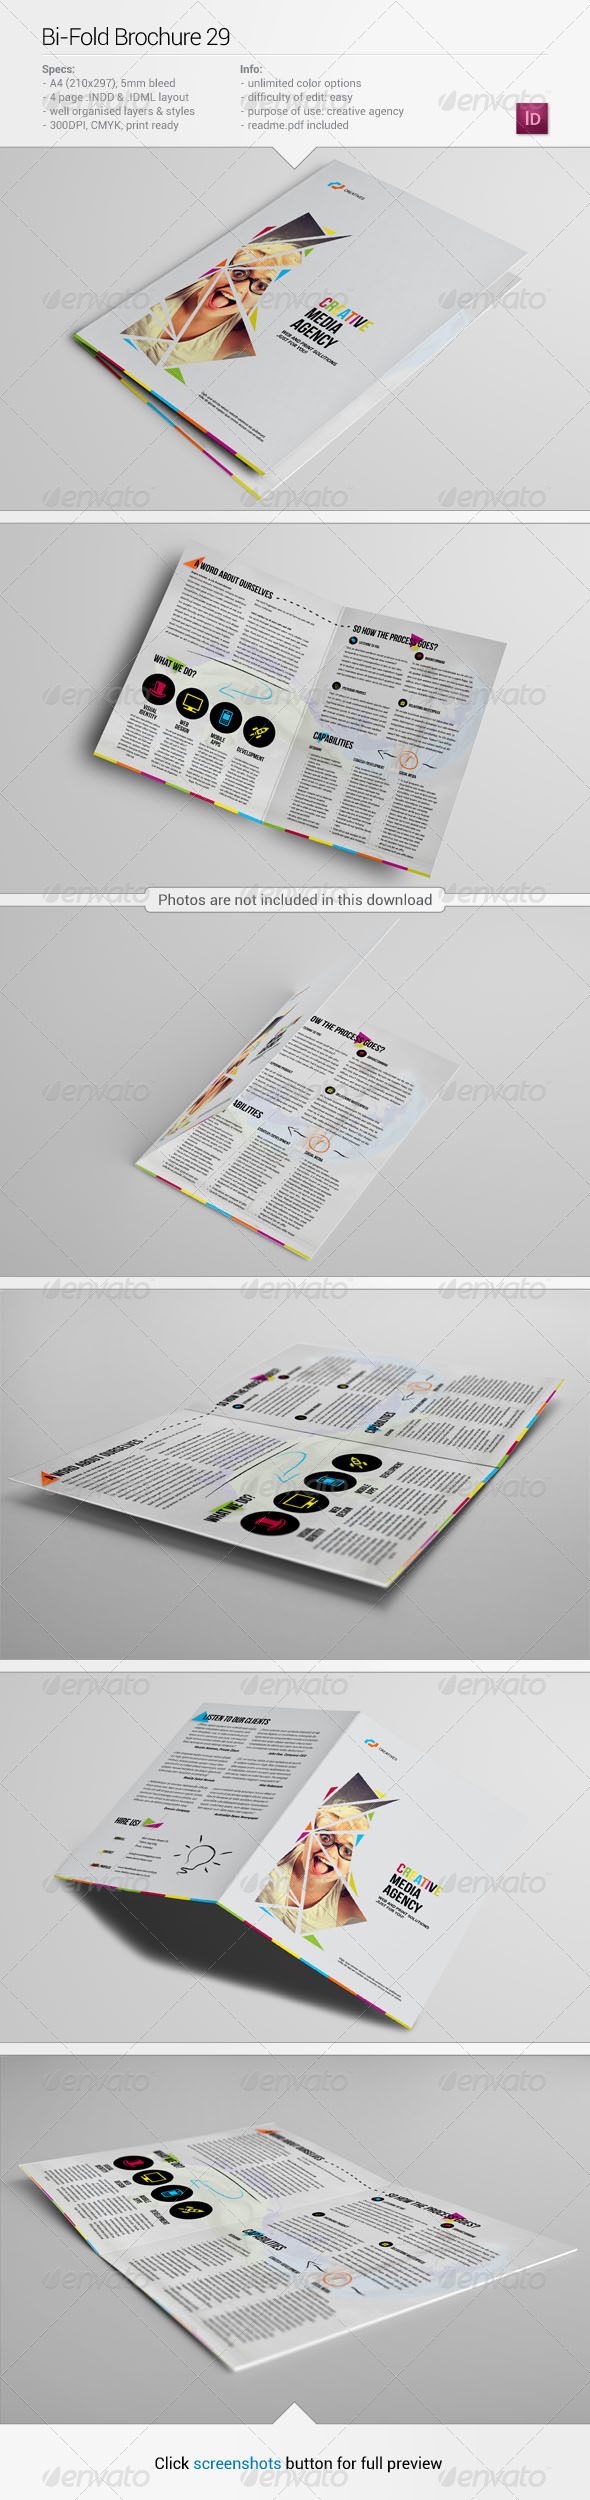 GraphicRiver Bi-Fold Brochure 29 5830433